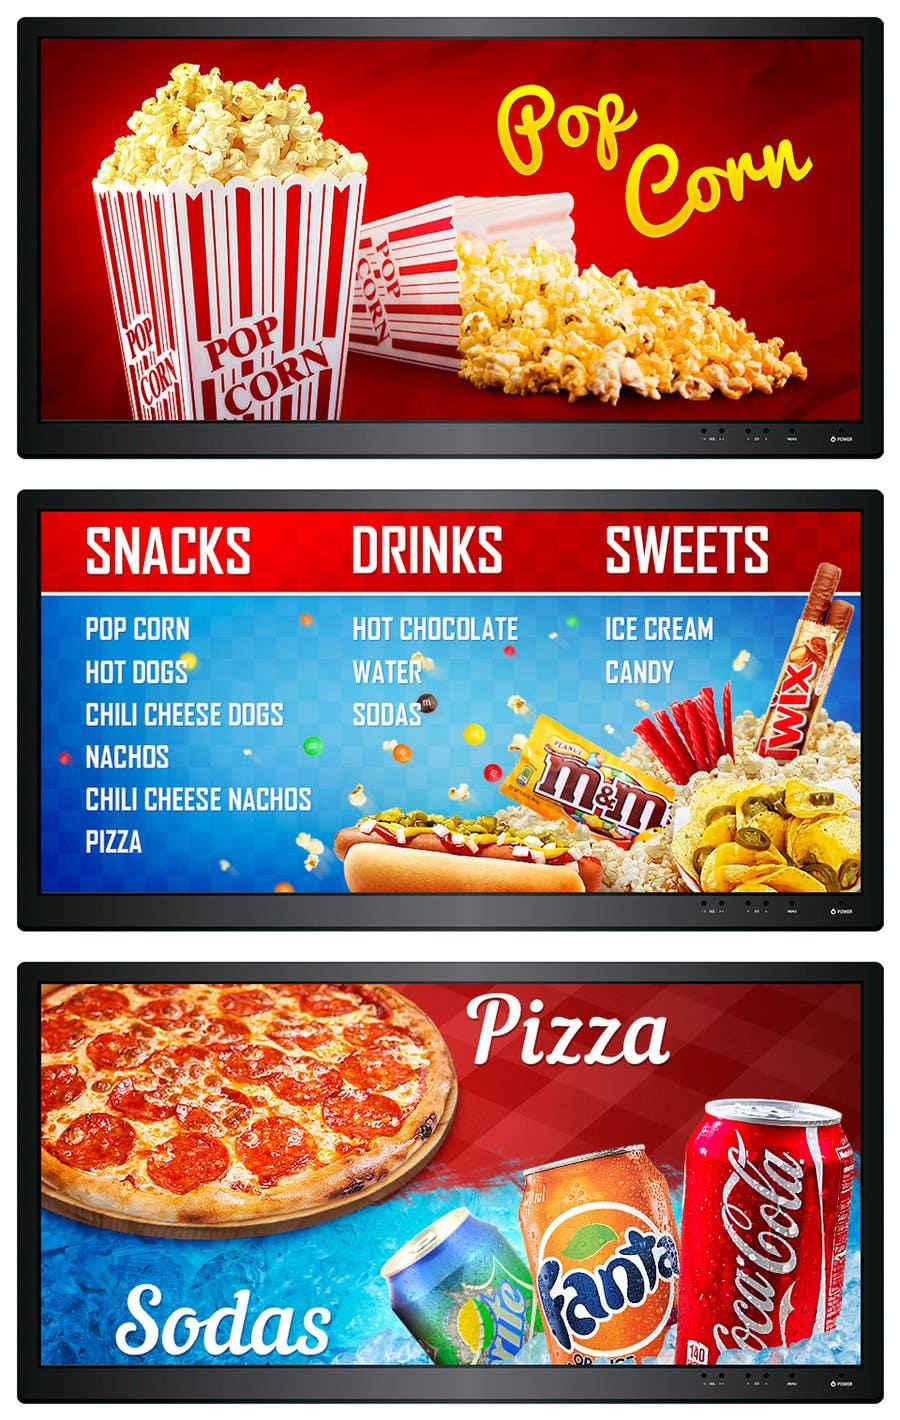 Basic Food Menu Structure